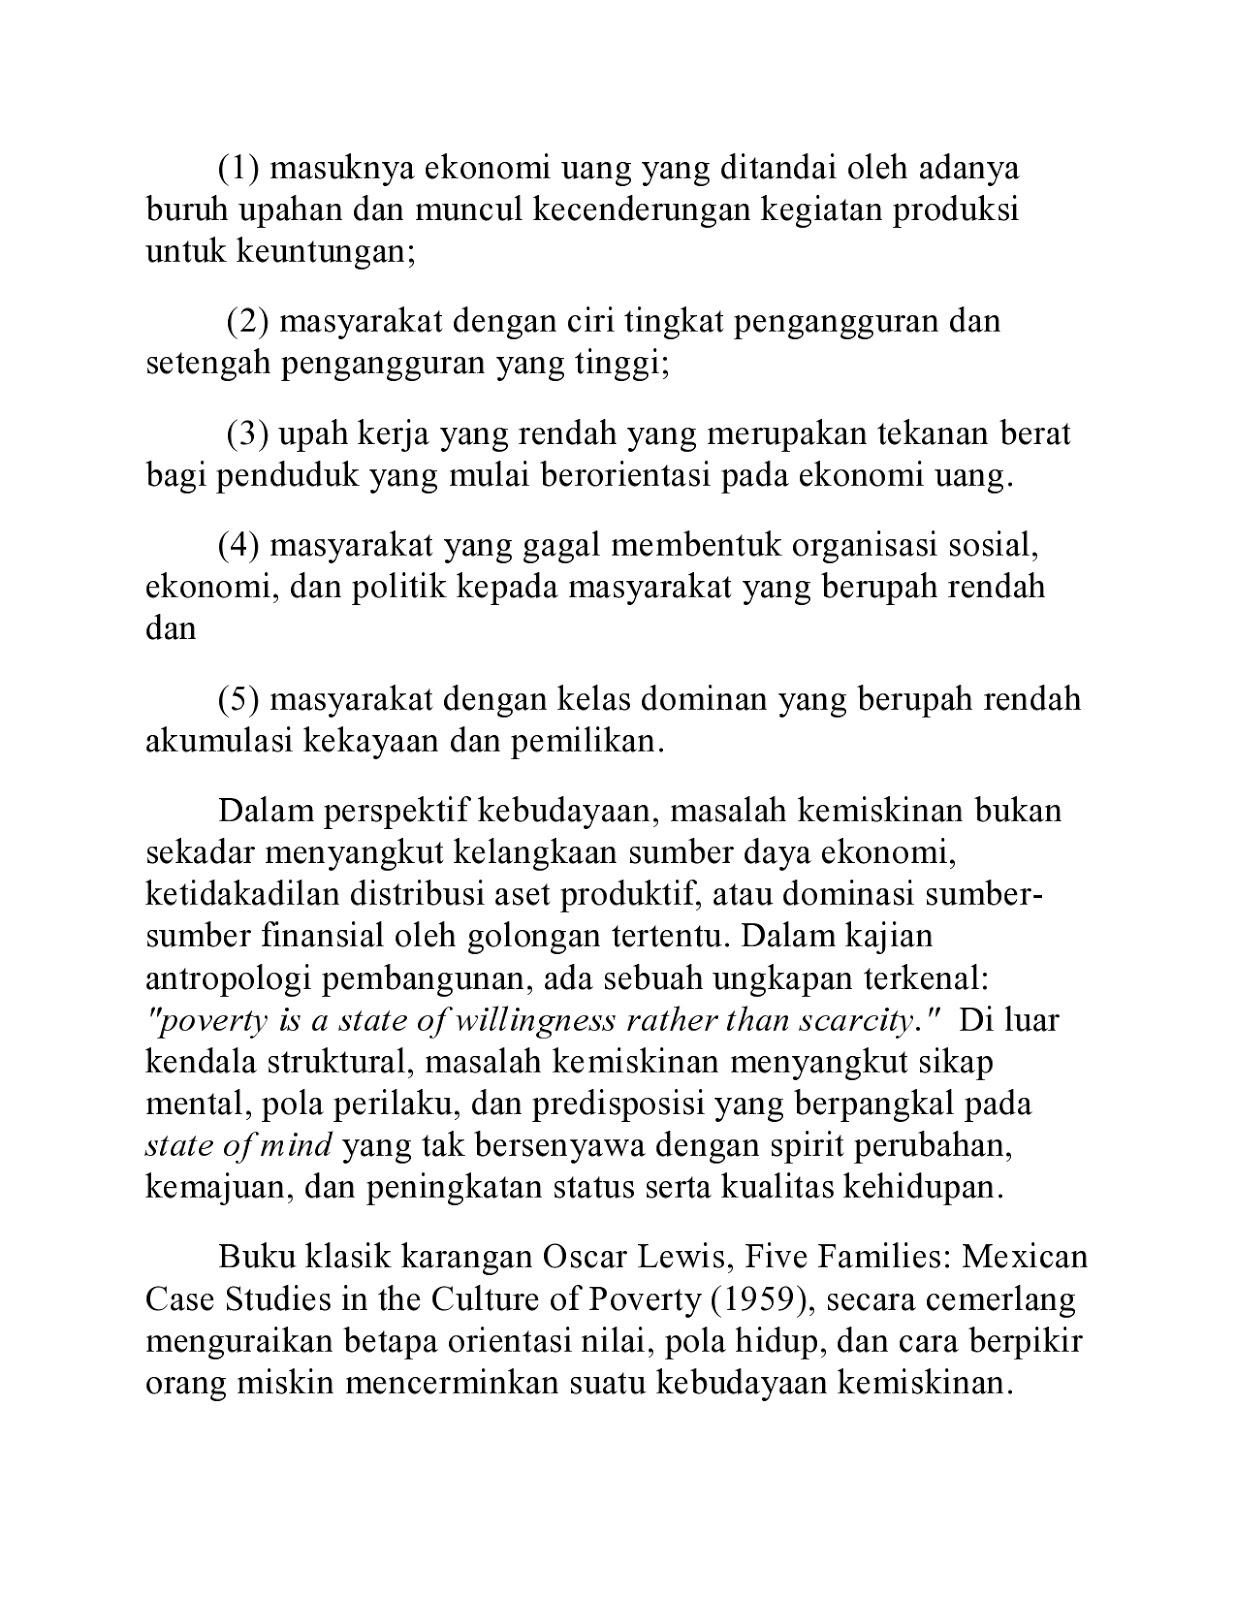 peksos bambang rustanto teori budaya kemiskinan teori budaya kemiskinan